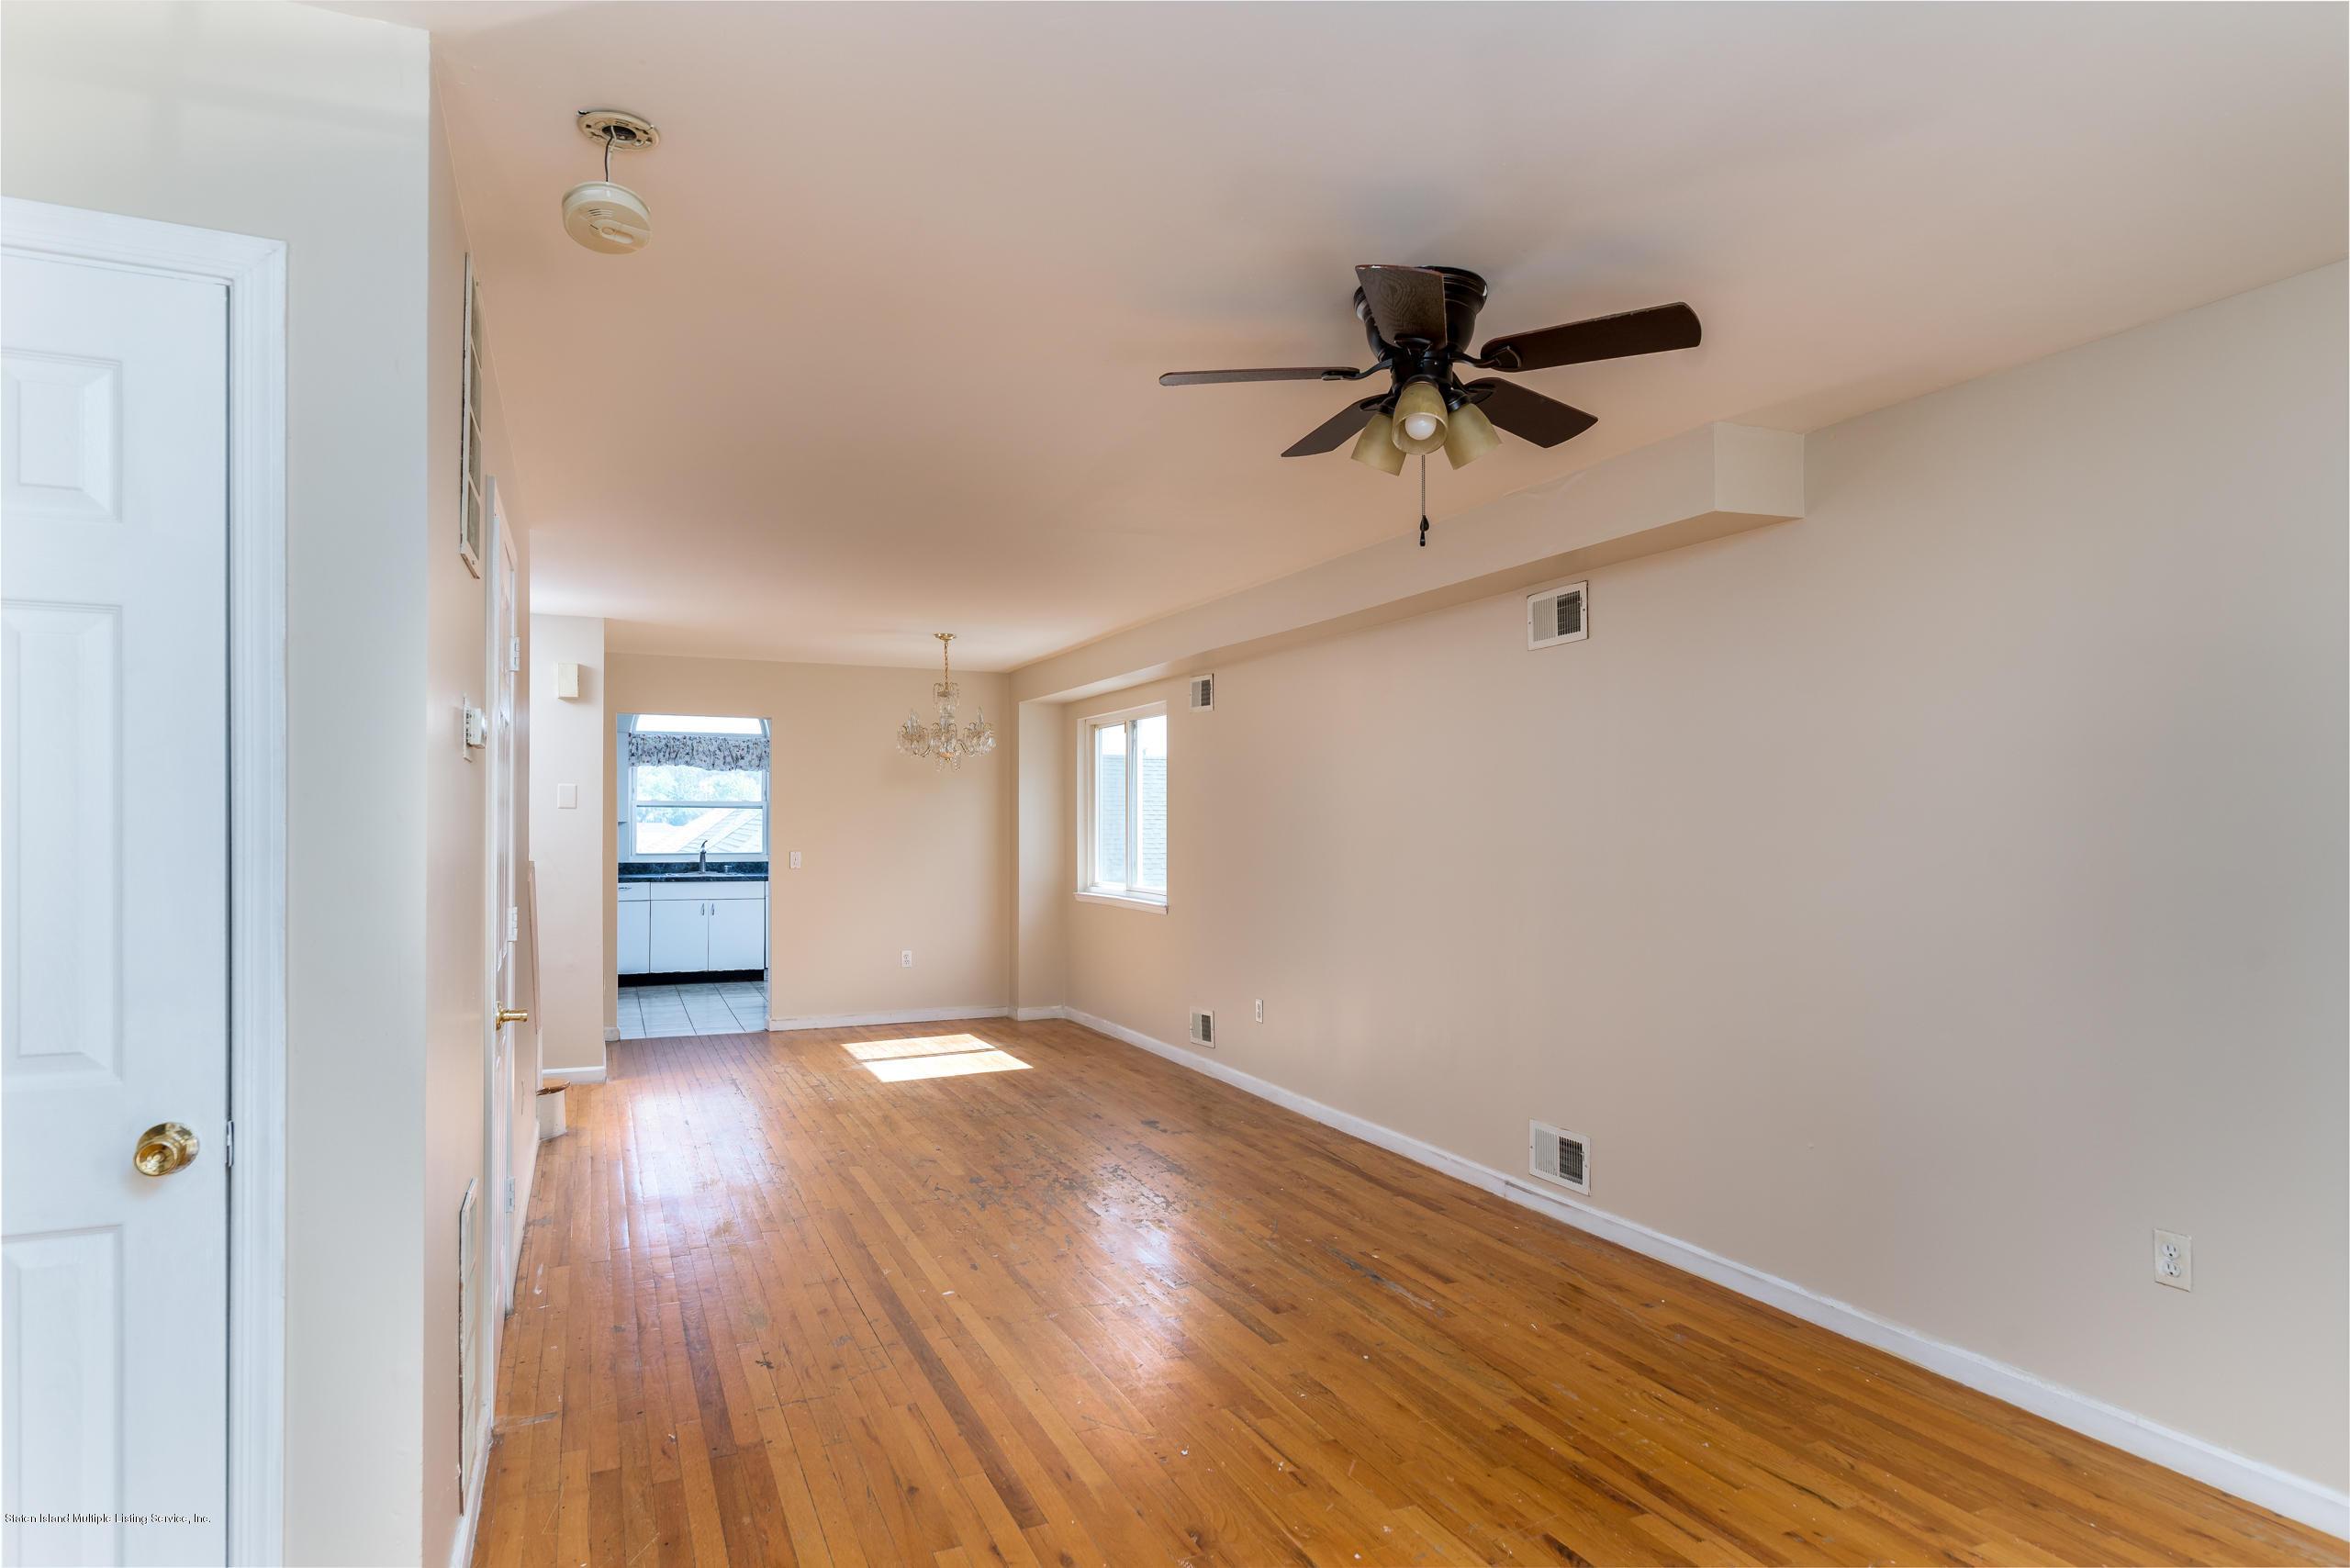 Single Family - Semi-Attached 230 Holden Boulevard  Staten Island, NY 10314, MLS-1130208-6